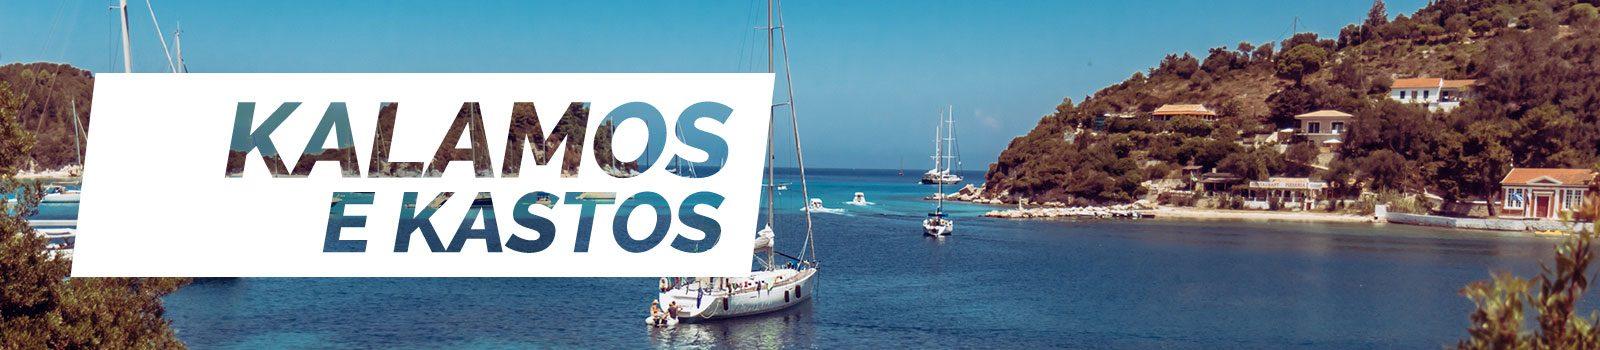 b8-barca-vela-kalamos-kastos